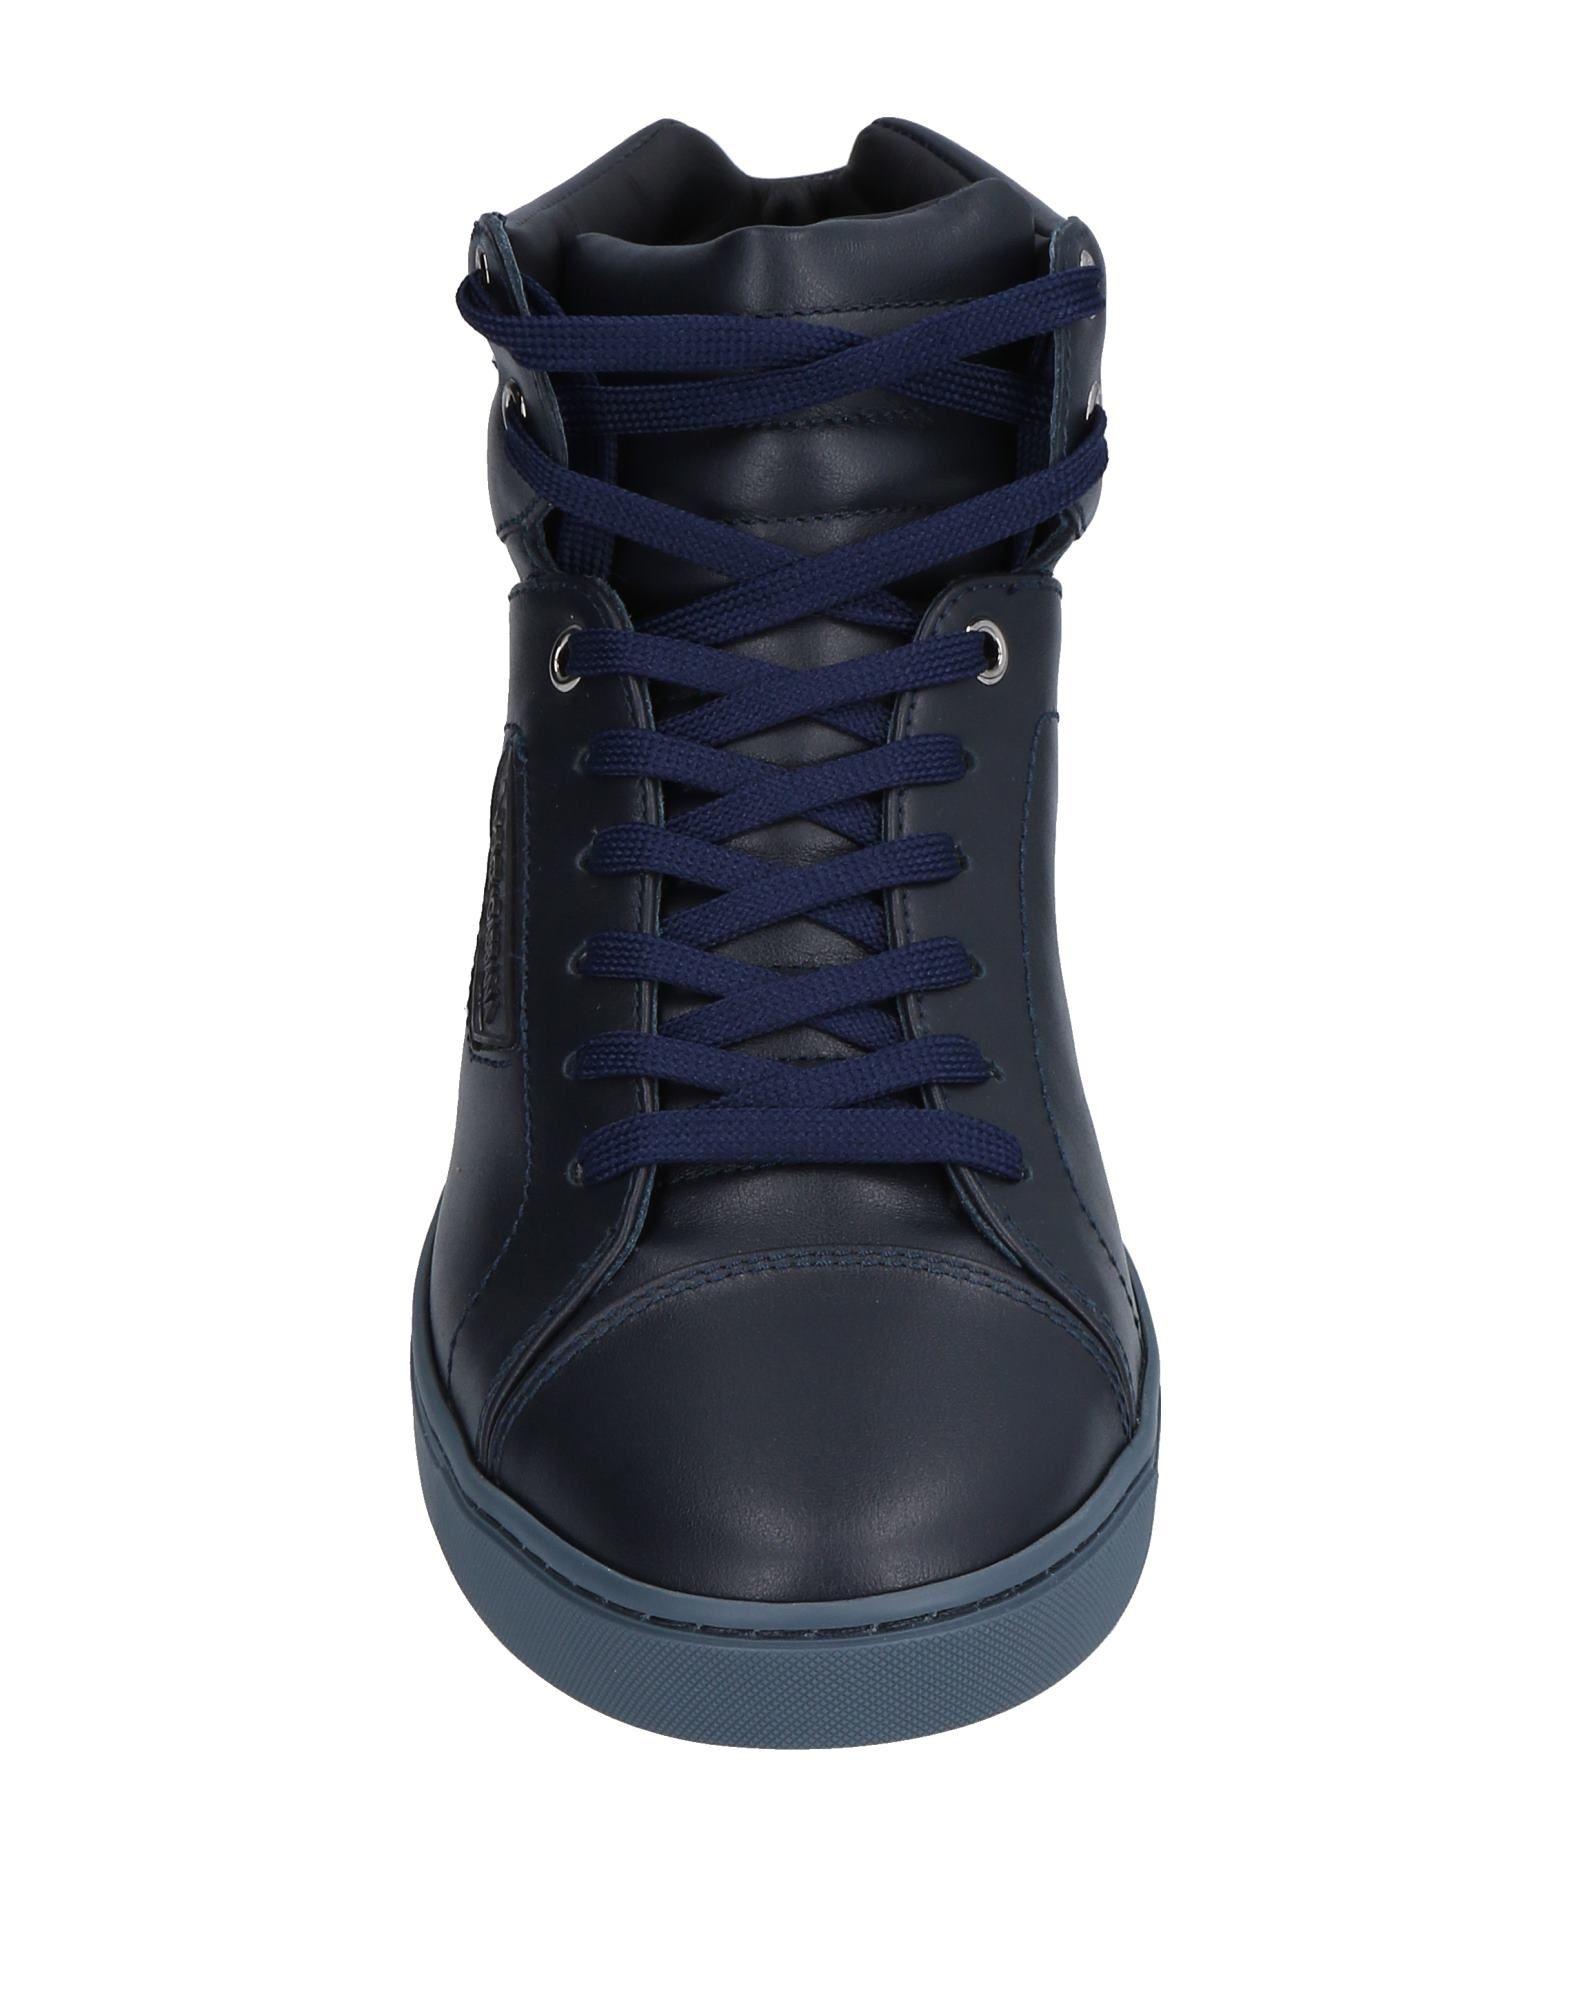 Dolce  & Gabbana Sneakers Herren  Dolce 11515579AJ Gute Qualität beliebte Schuhe fce4c6